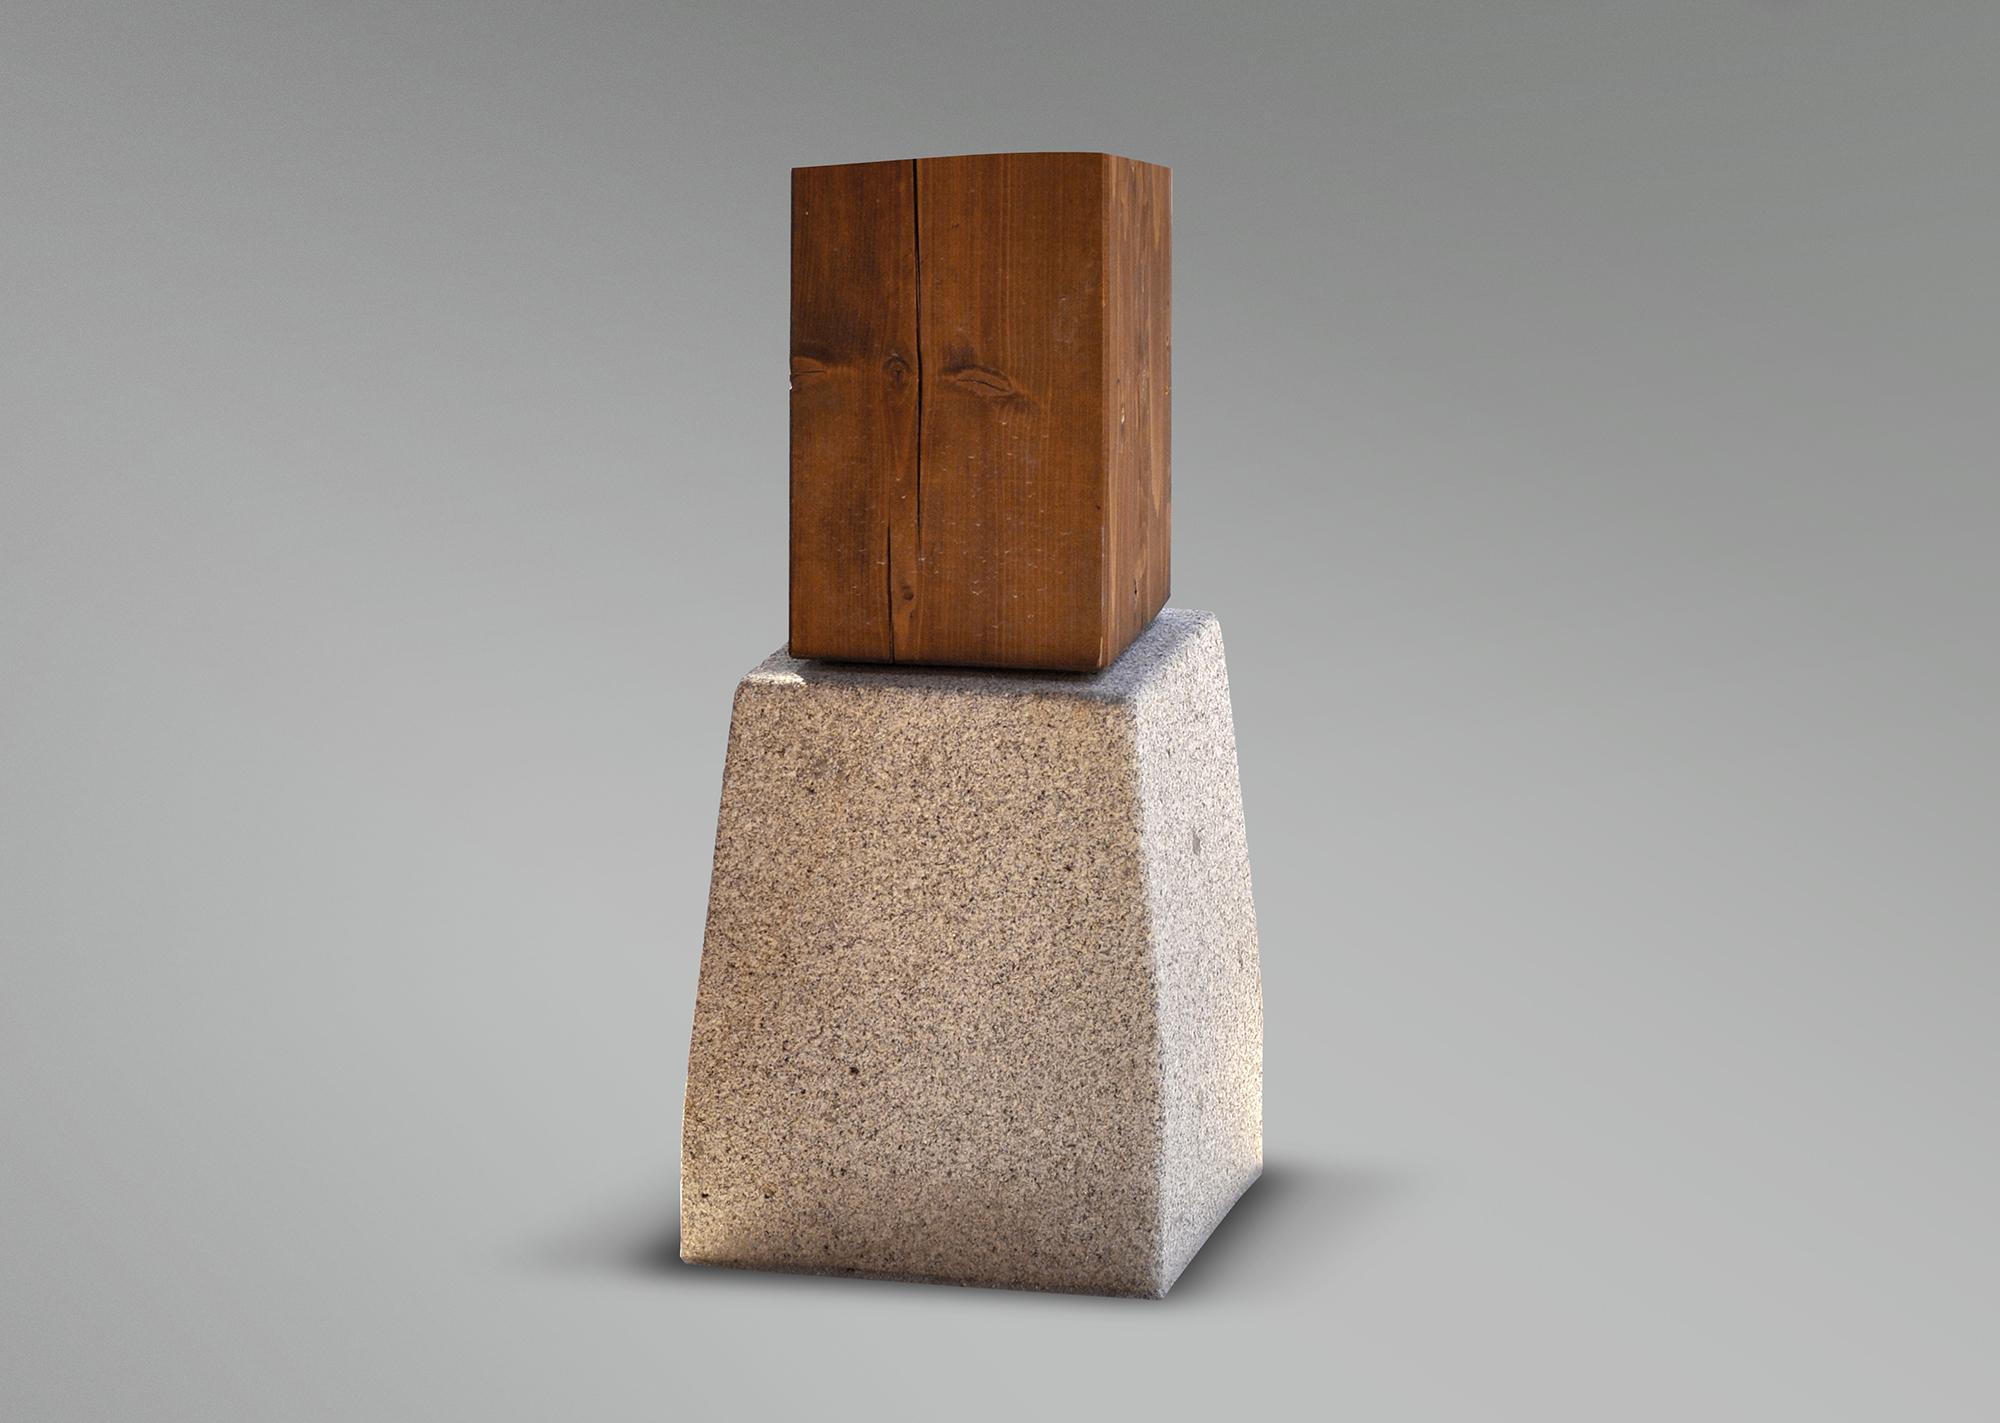 Base de pilar